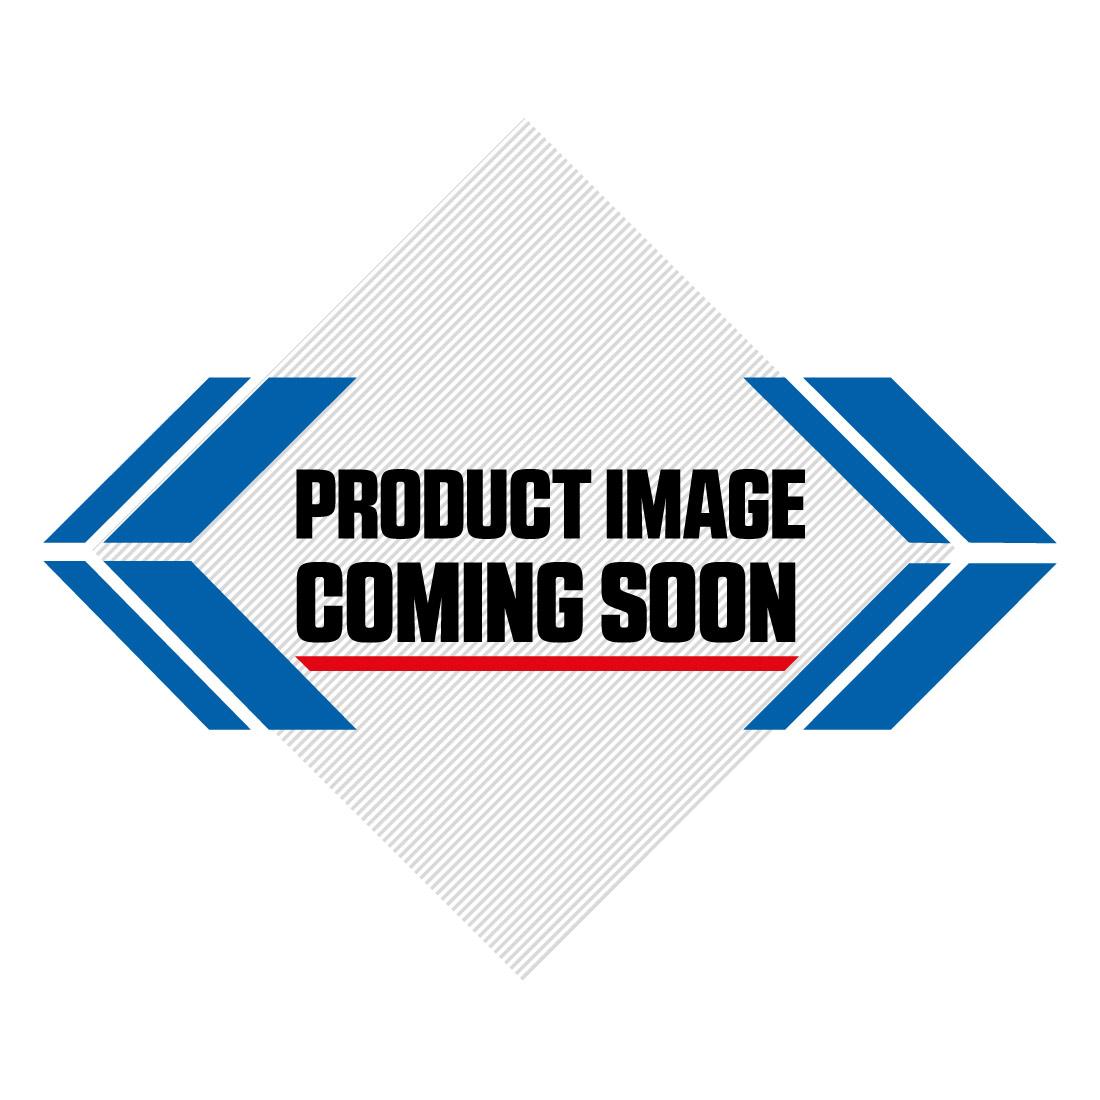 Suzuki Plastic Kit RMZ 450 (11-12) OEM Factory Image-4>